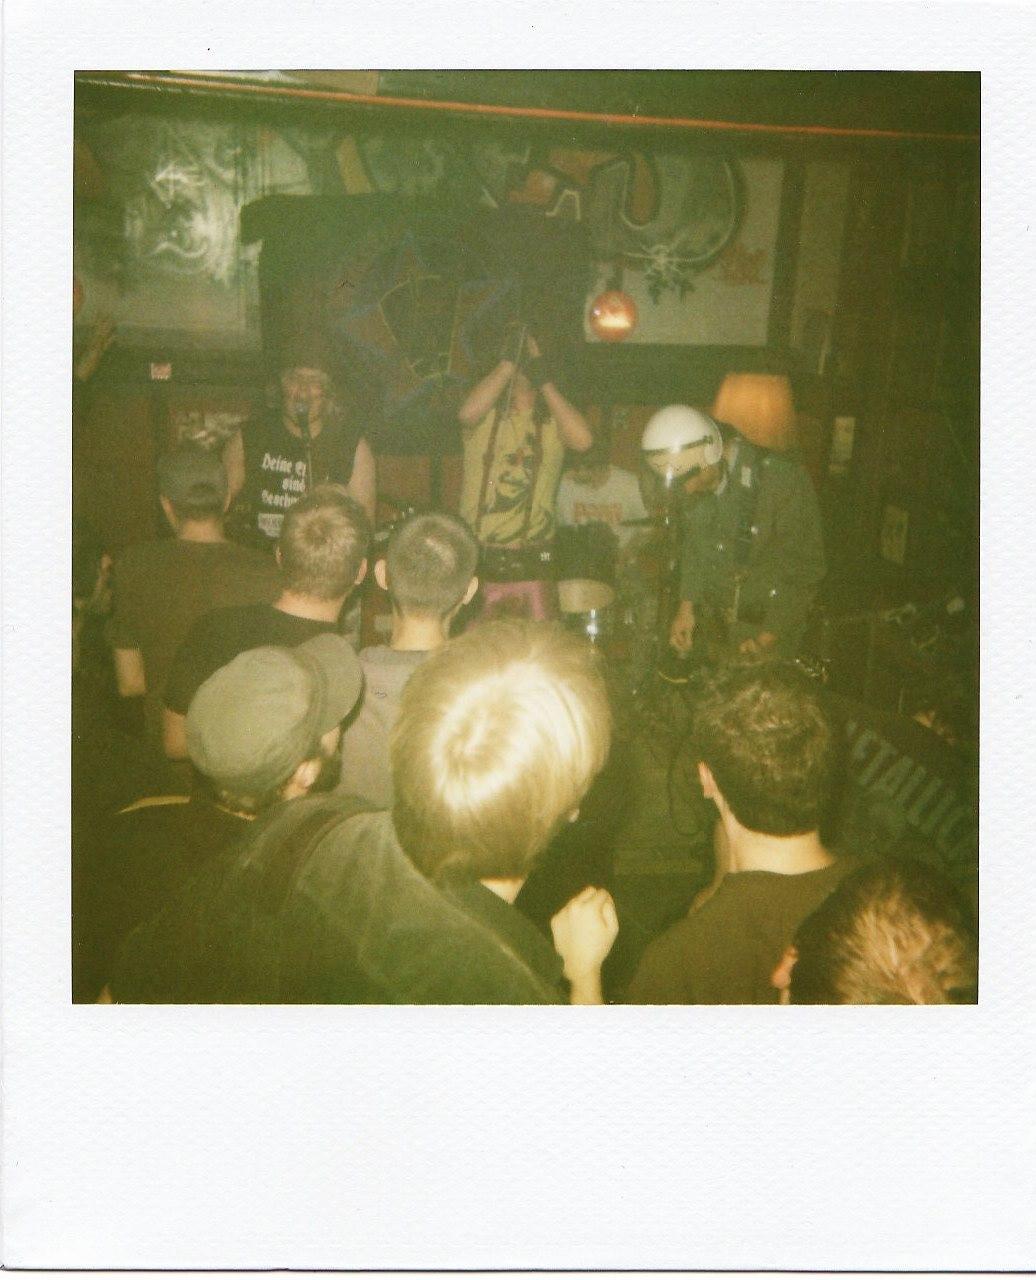 Limes 23.01.2010